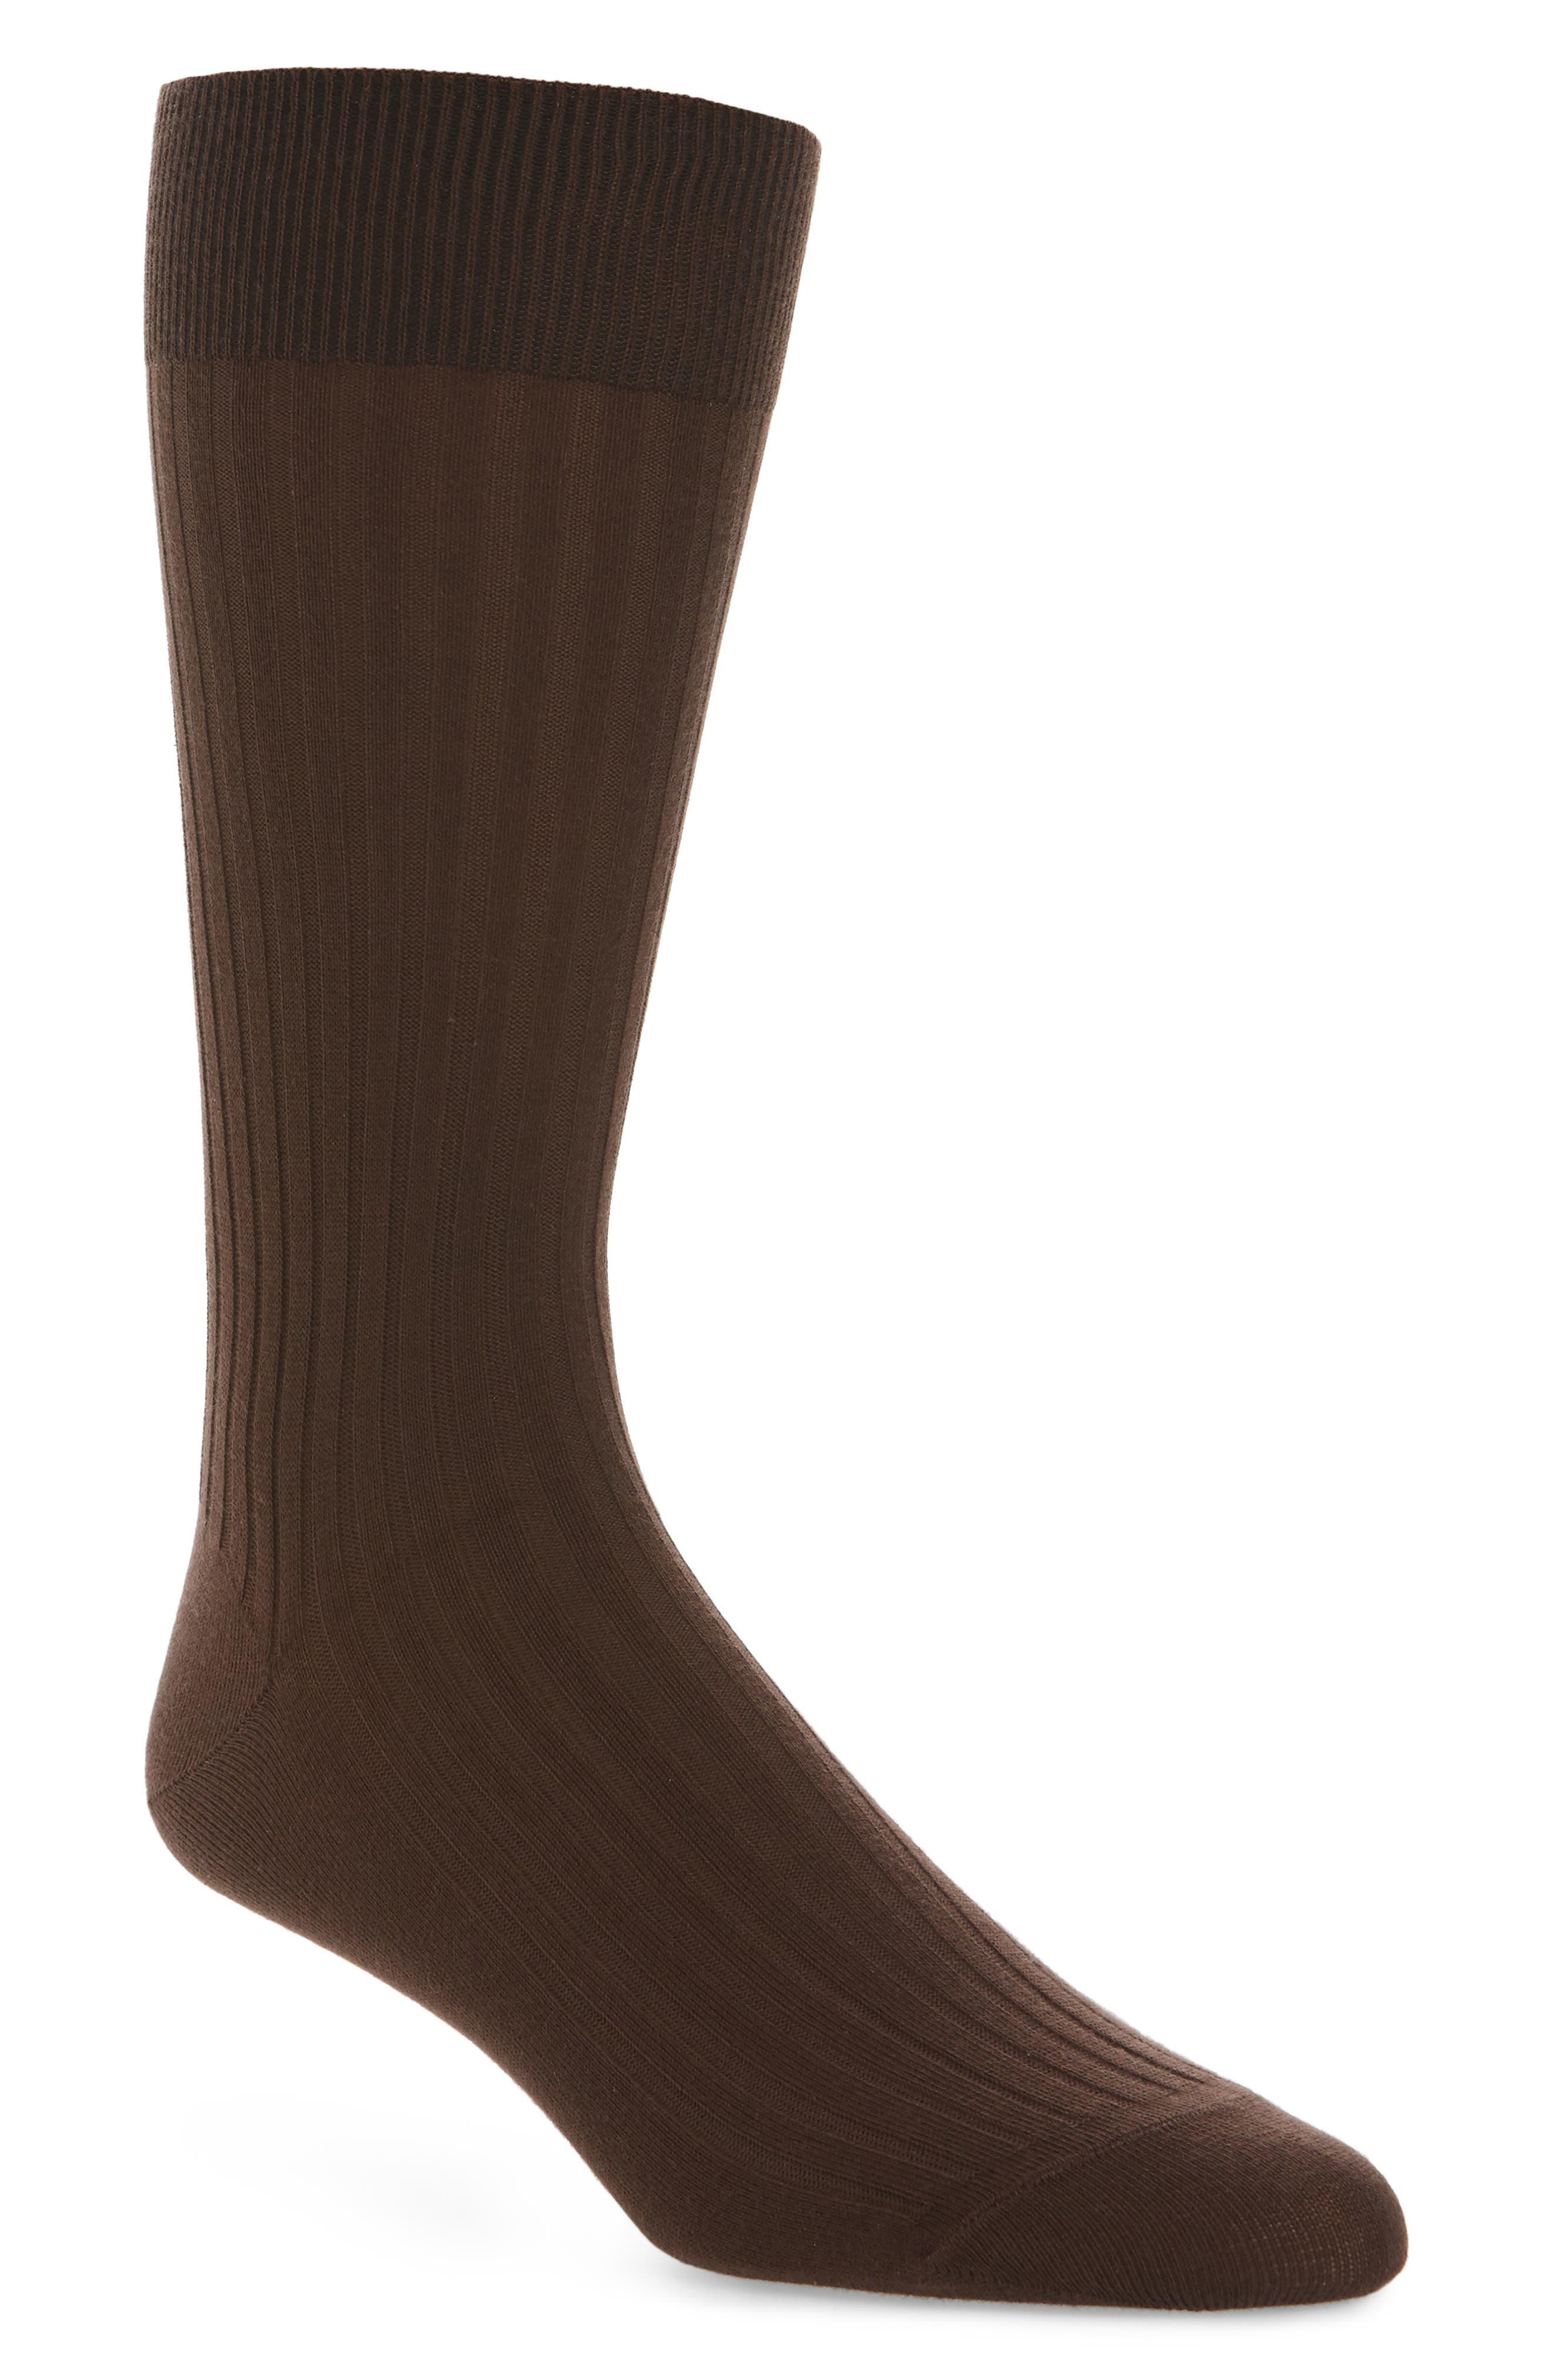 Main Image - John W. Nordstrom® Ribbed Pima Cotton Crew Socks